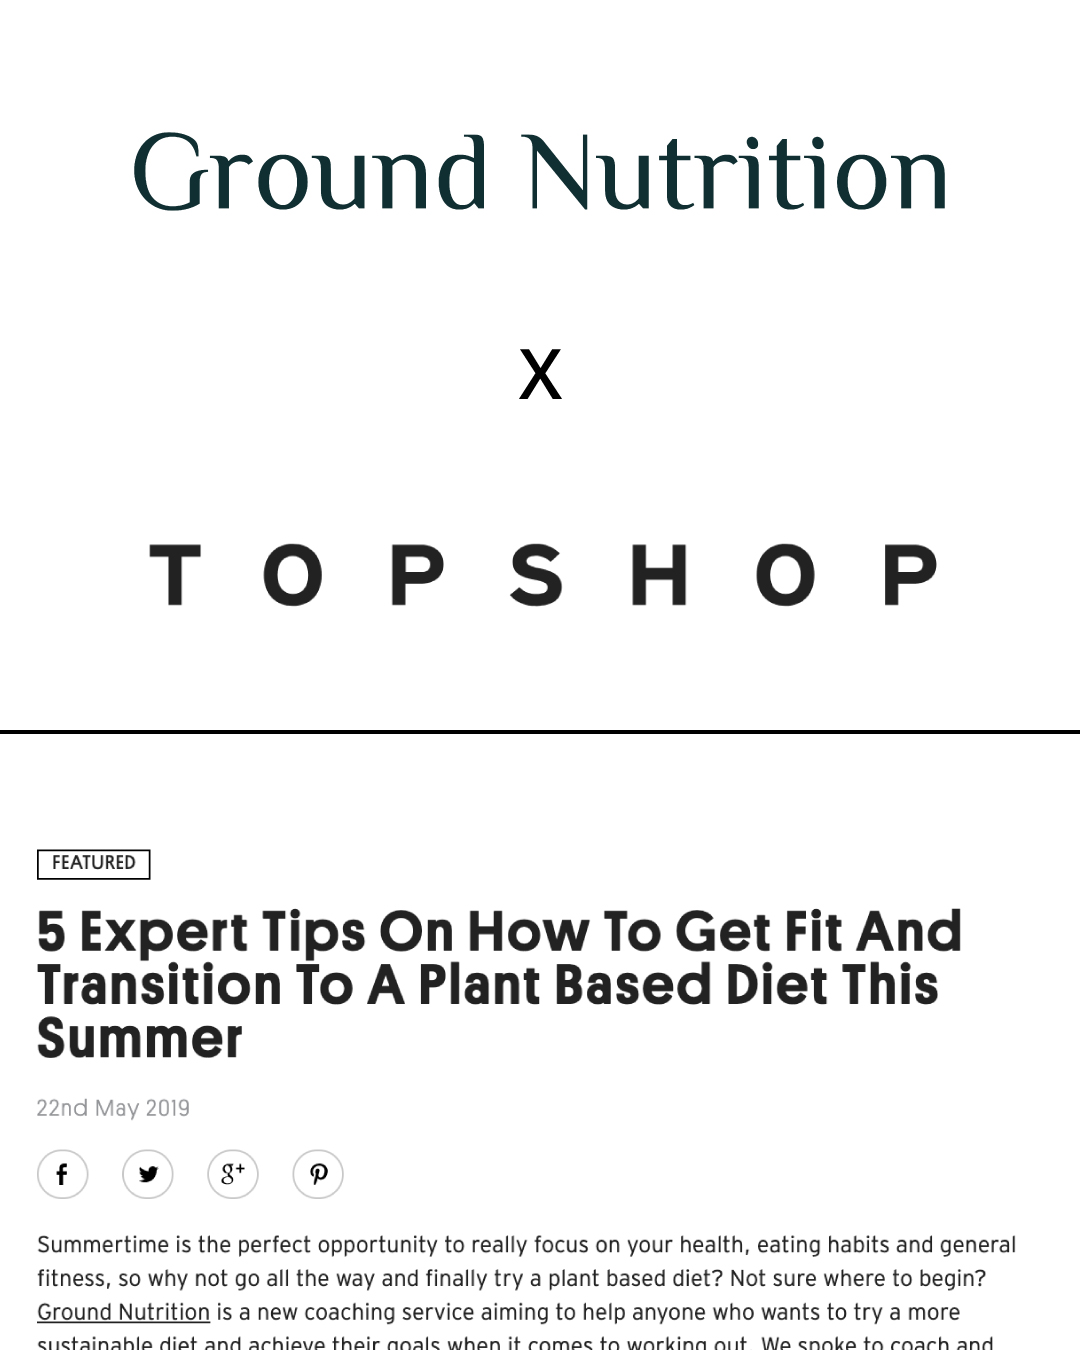 Topshop-Feature-1.jpg